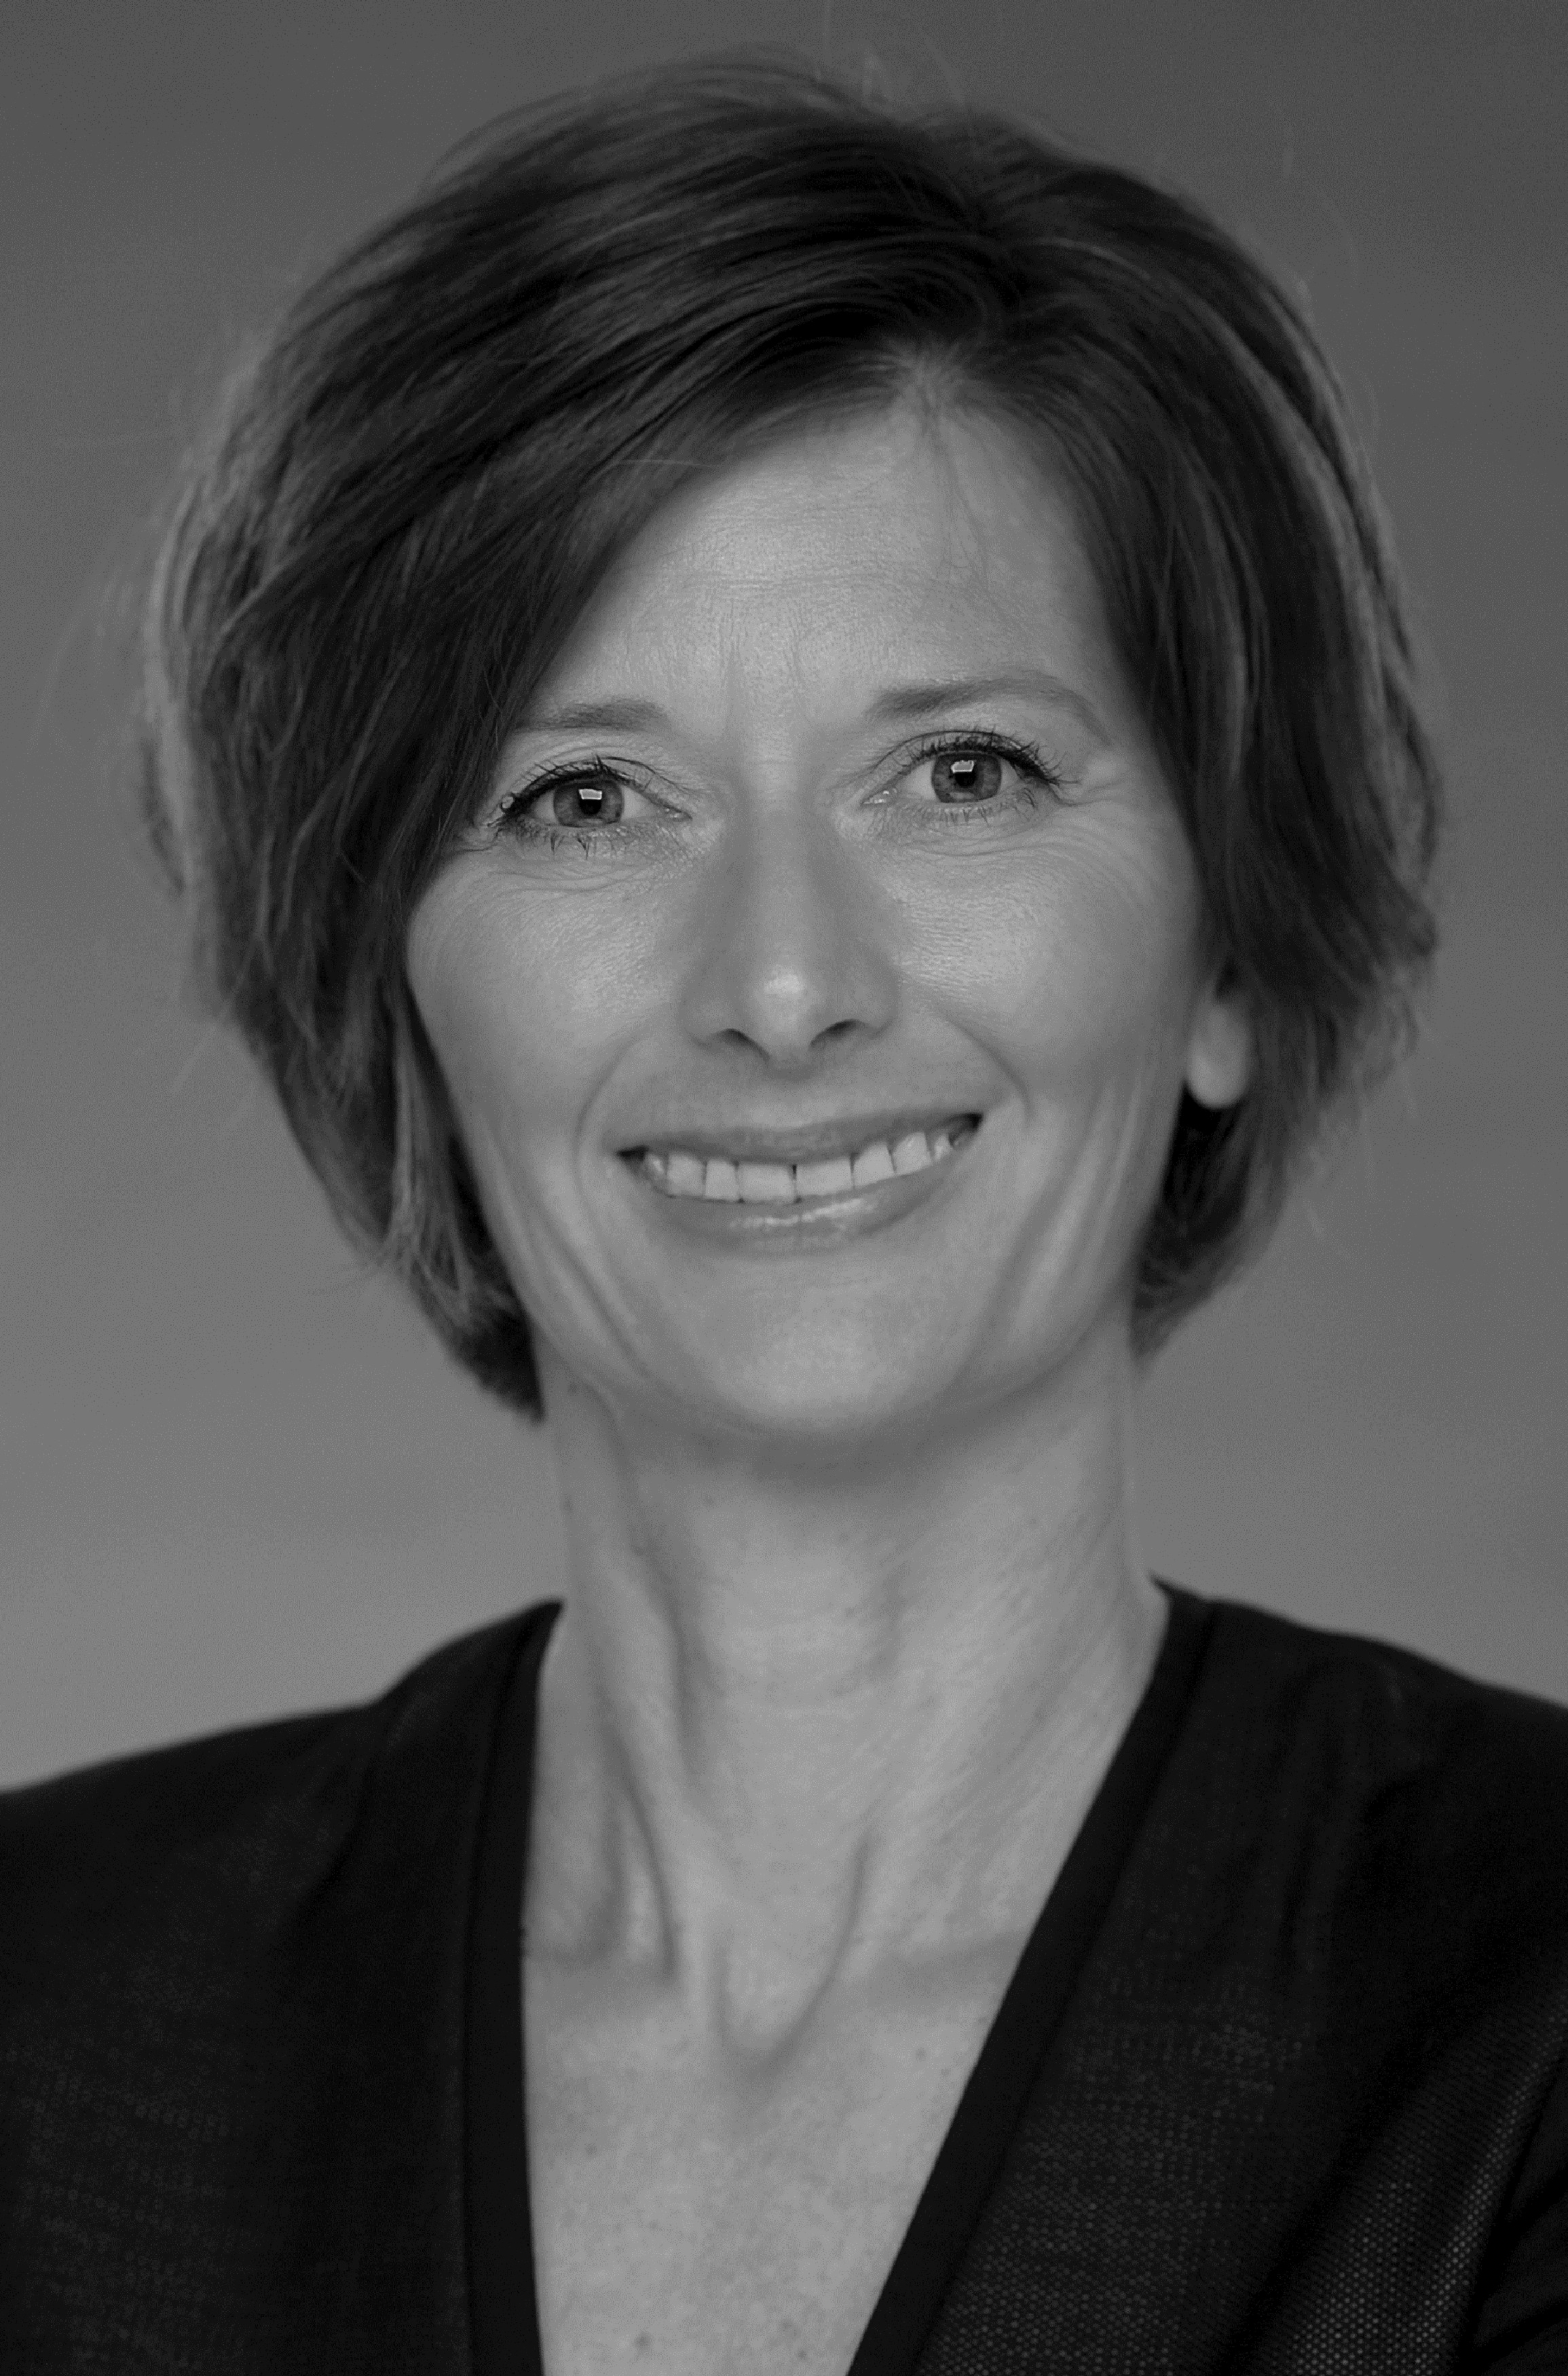 Susan J. Merritt